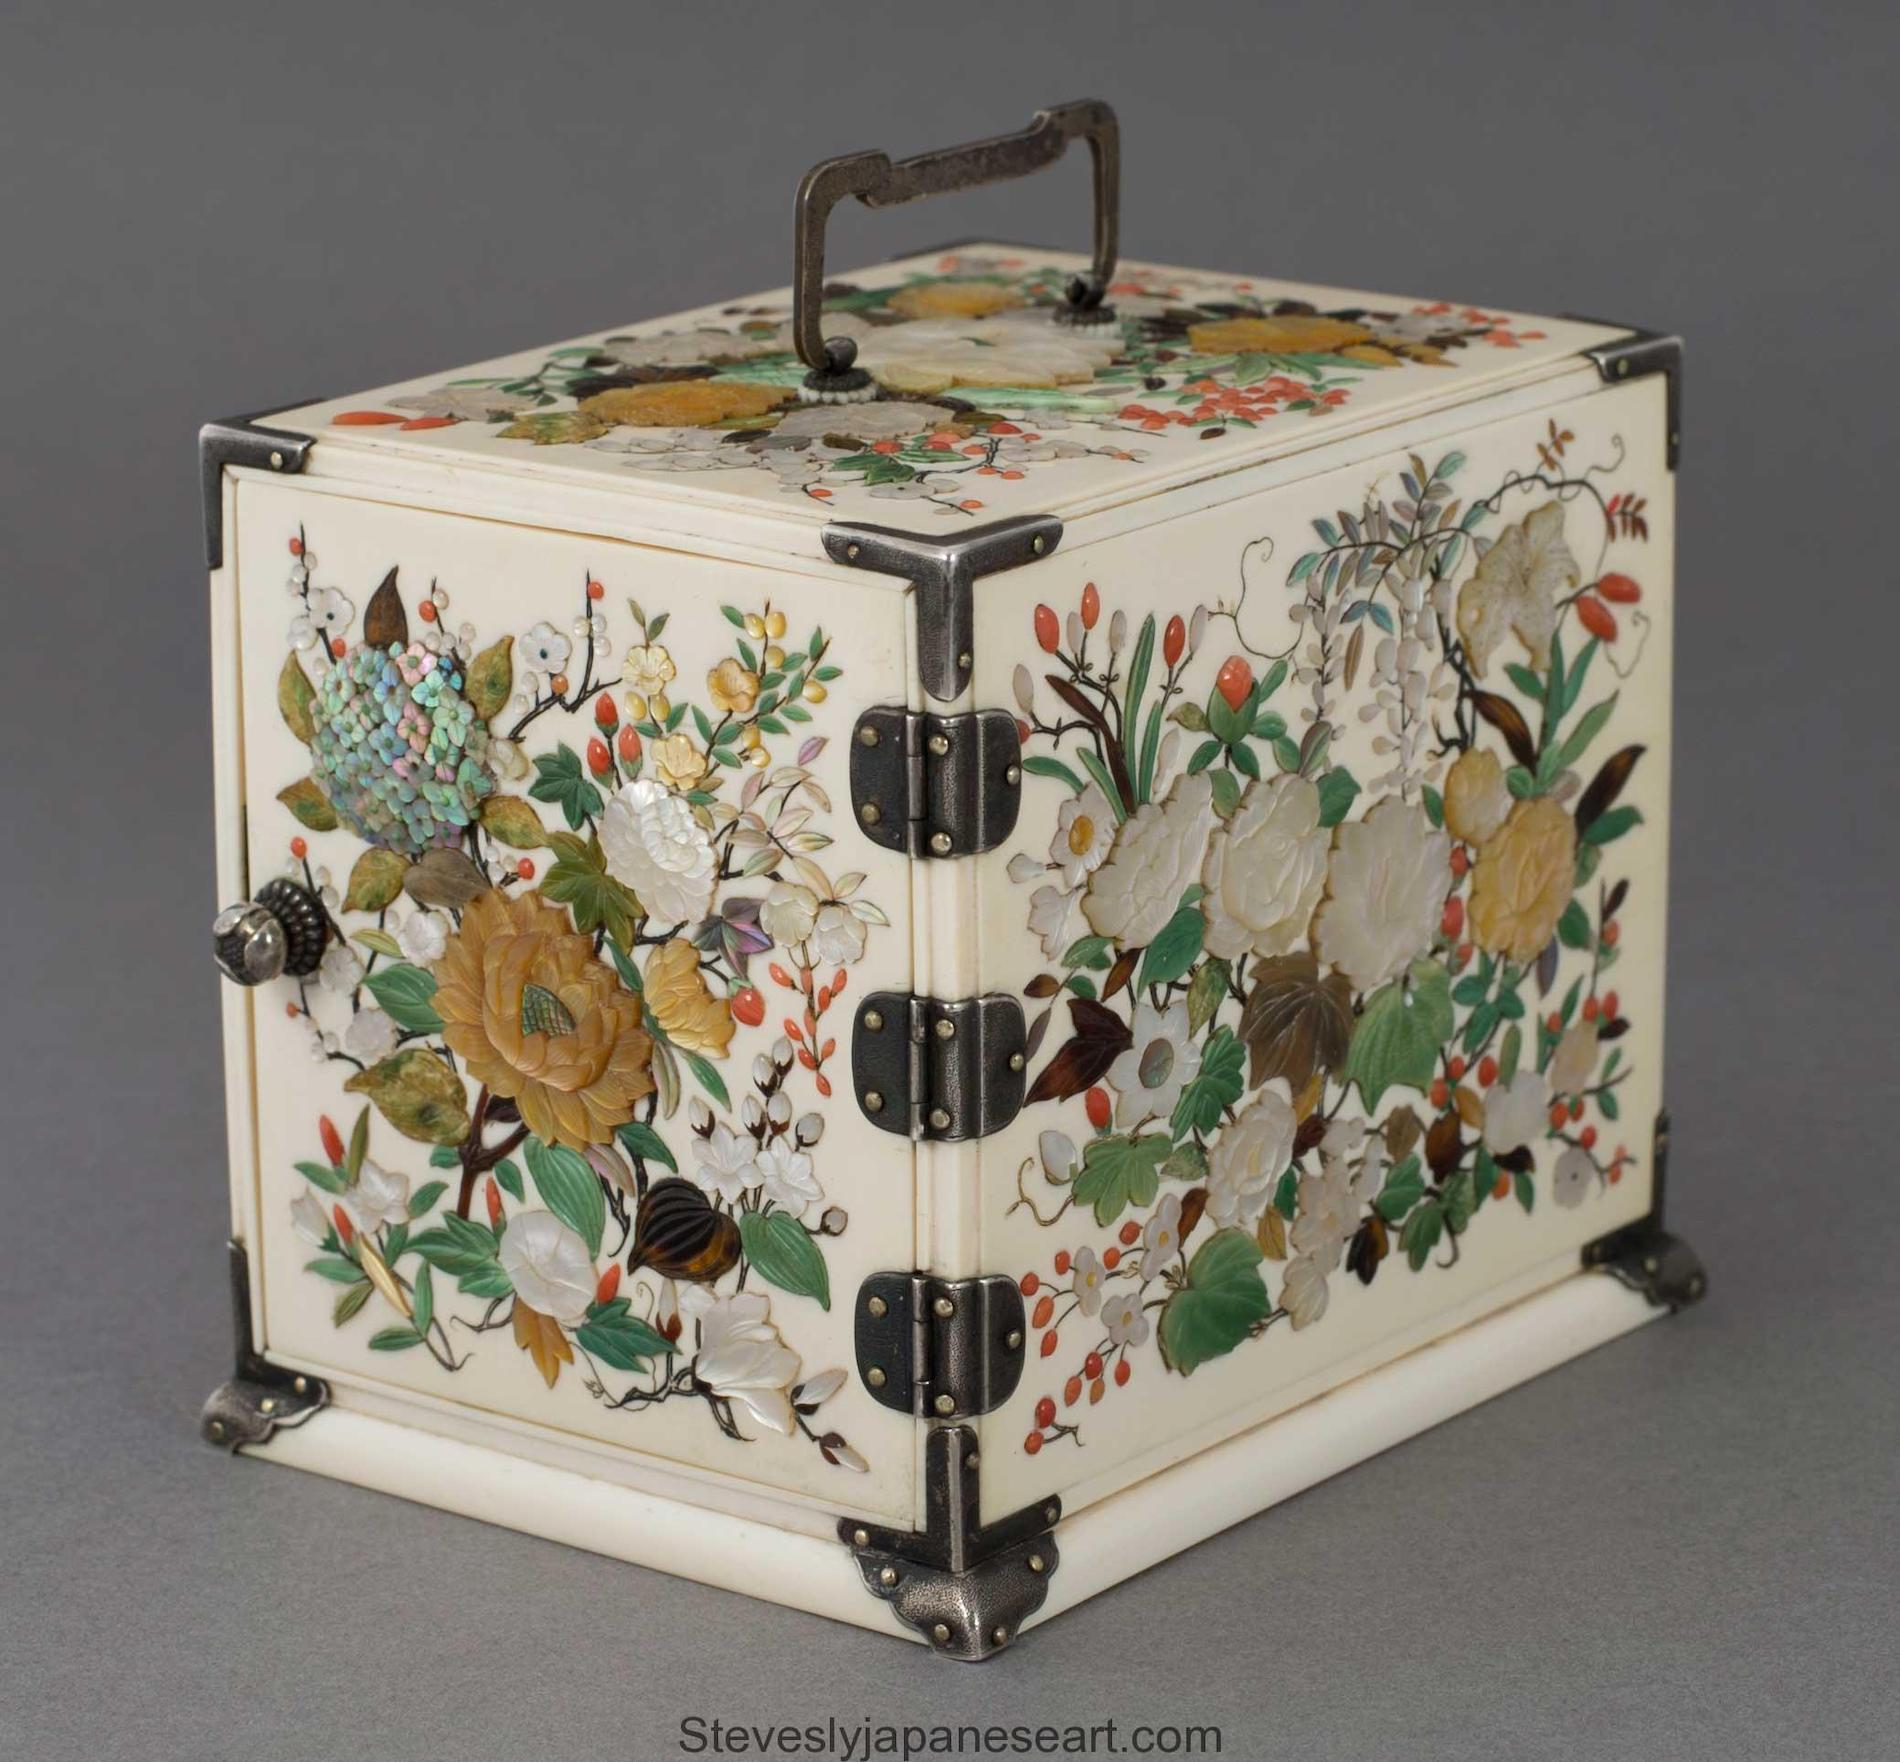 Meiji period (1868-1912), Ivory & Shibayama Kodansu ,Circa1890 Height: 11.4cm, 4.5 inches Width: 8.8cm, 3.4 inches Depth: 11.7cm, 4.6 inches